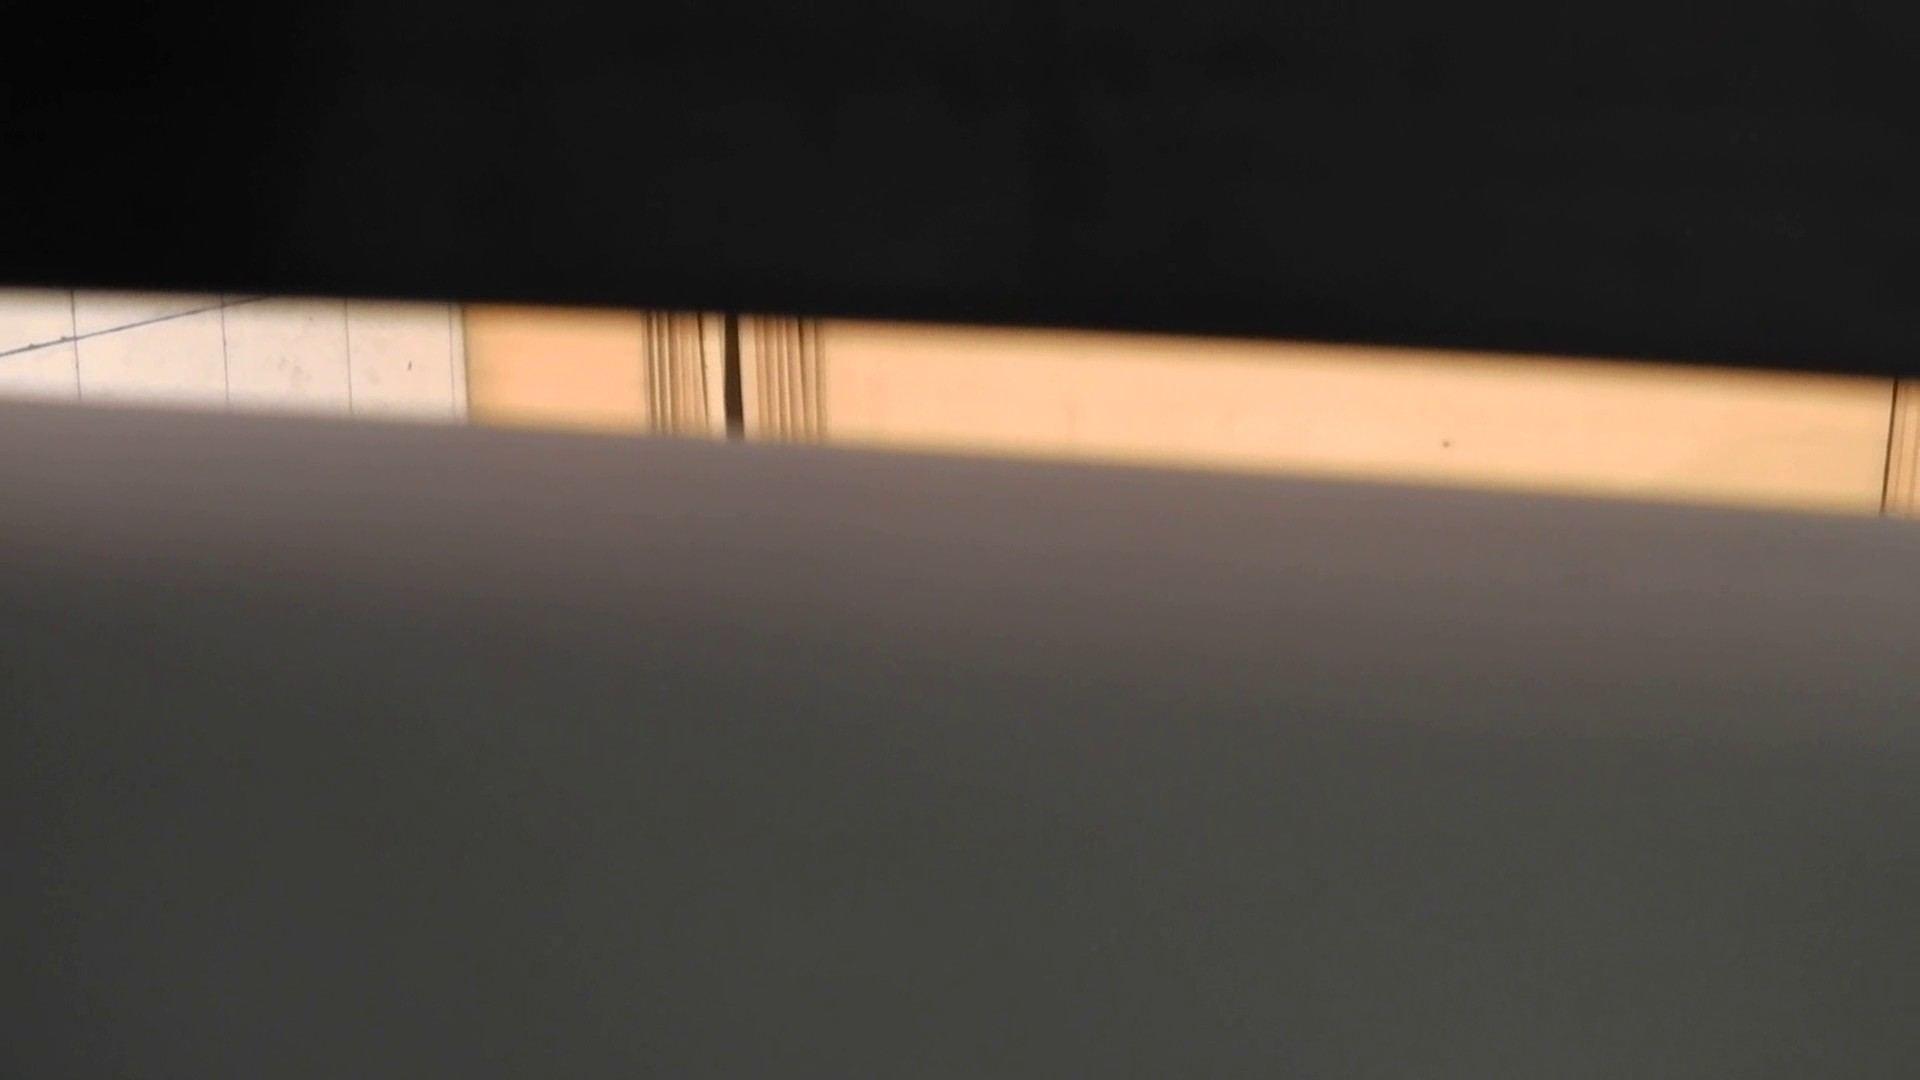 vol.25三十時間潜り、一つしか出会えない完璧桃尻編 byお銀 洗面所 のぞき動画キャプチャ 96連発 43